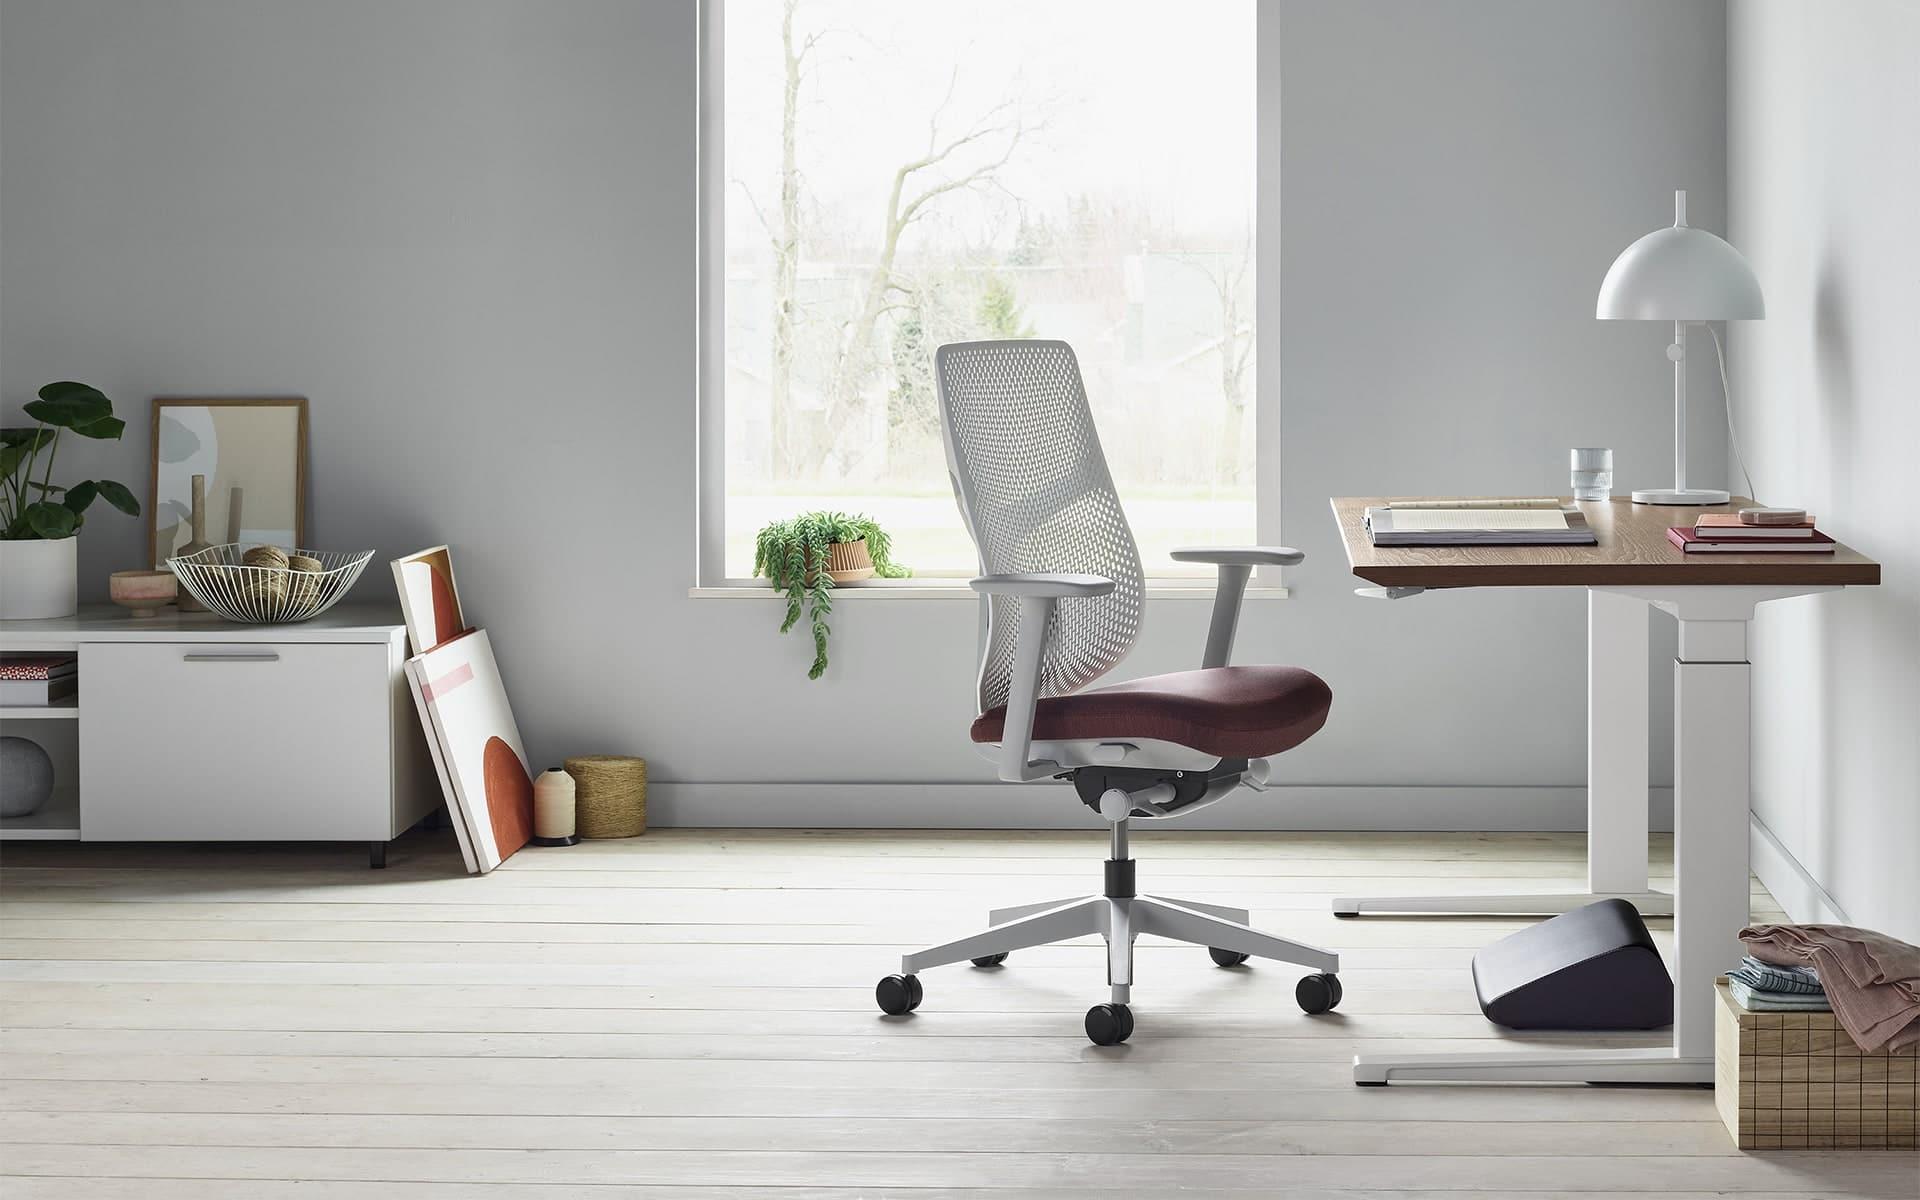 cadeira Verus da Herman Miller